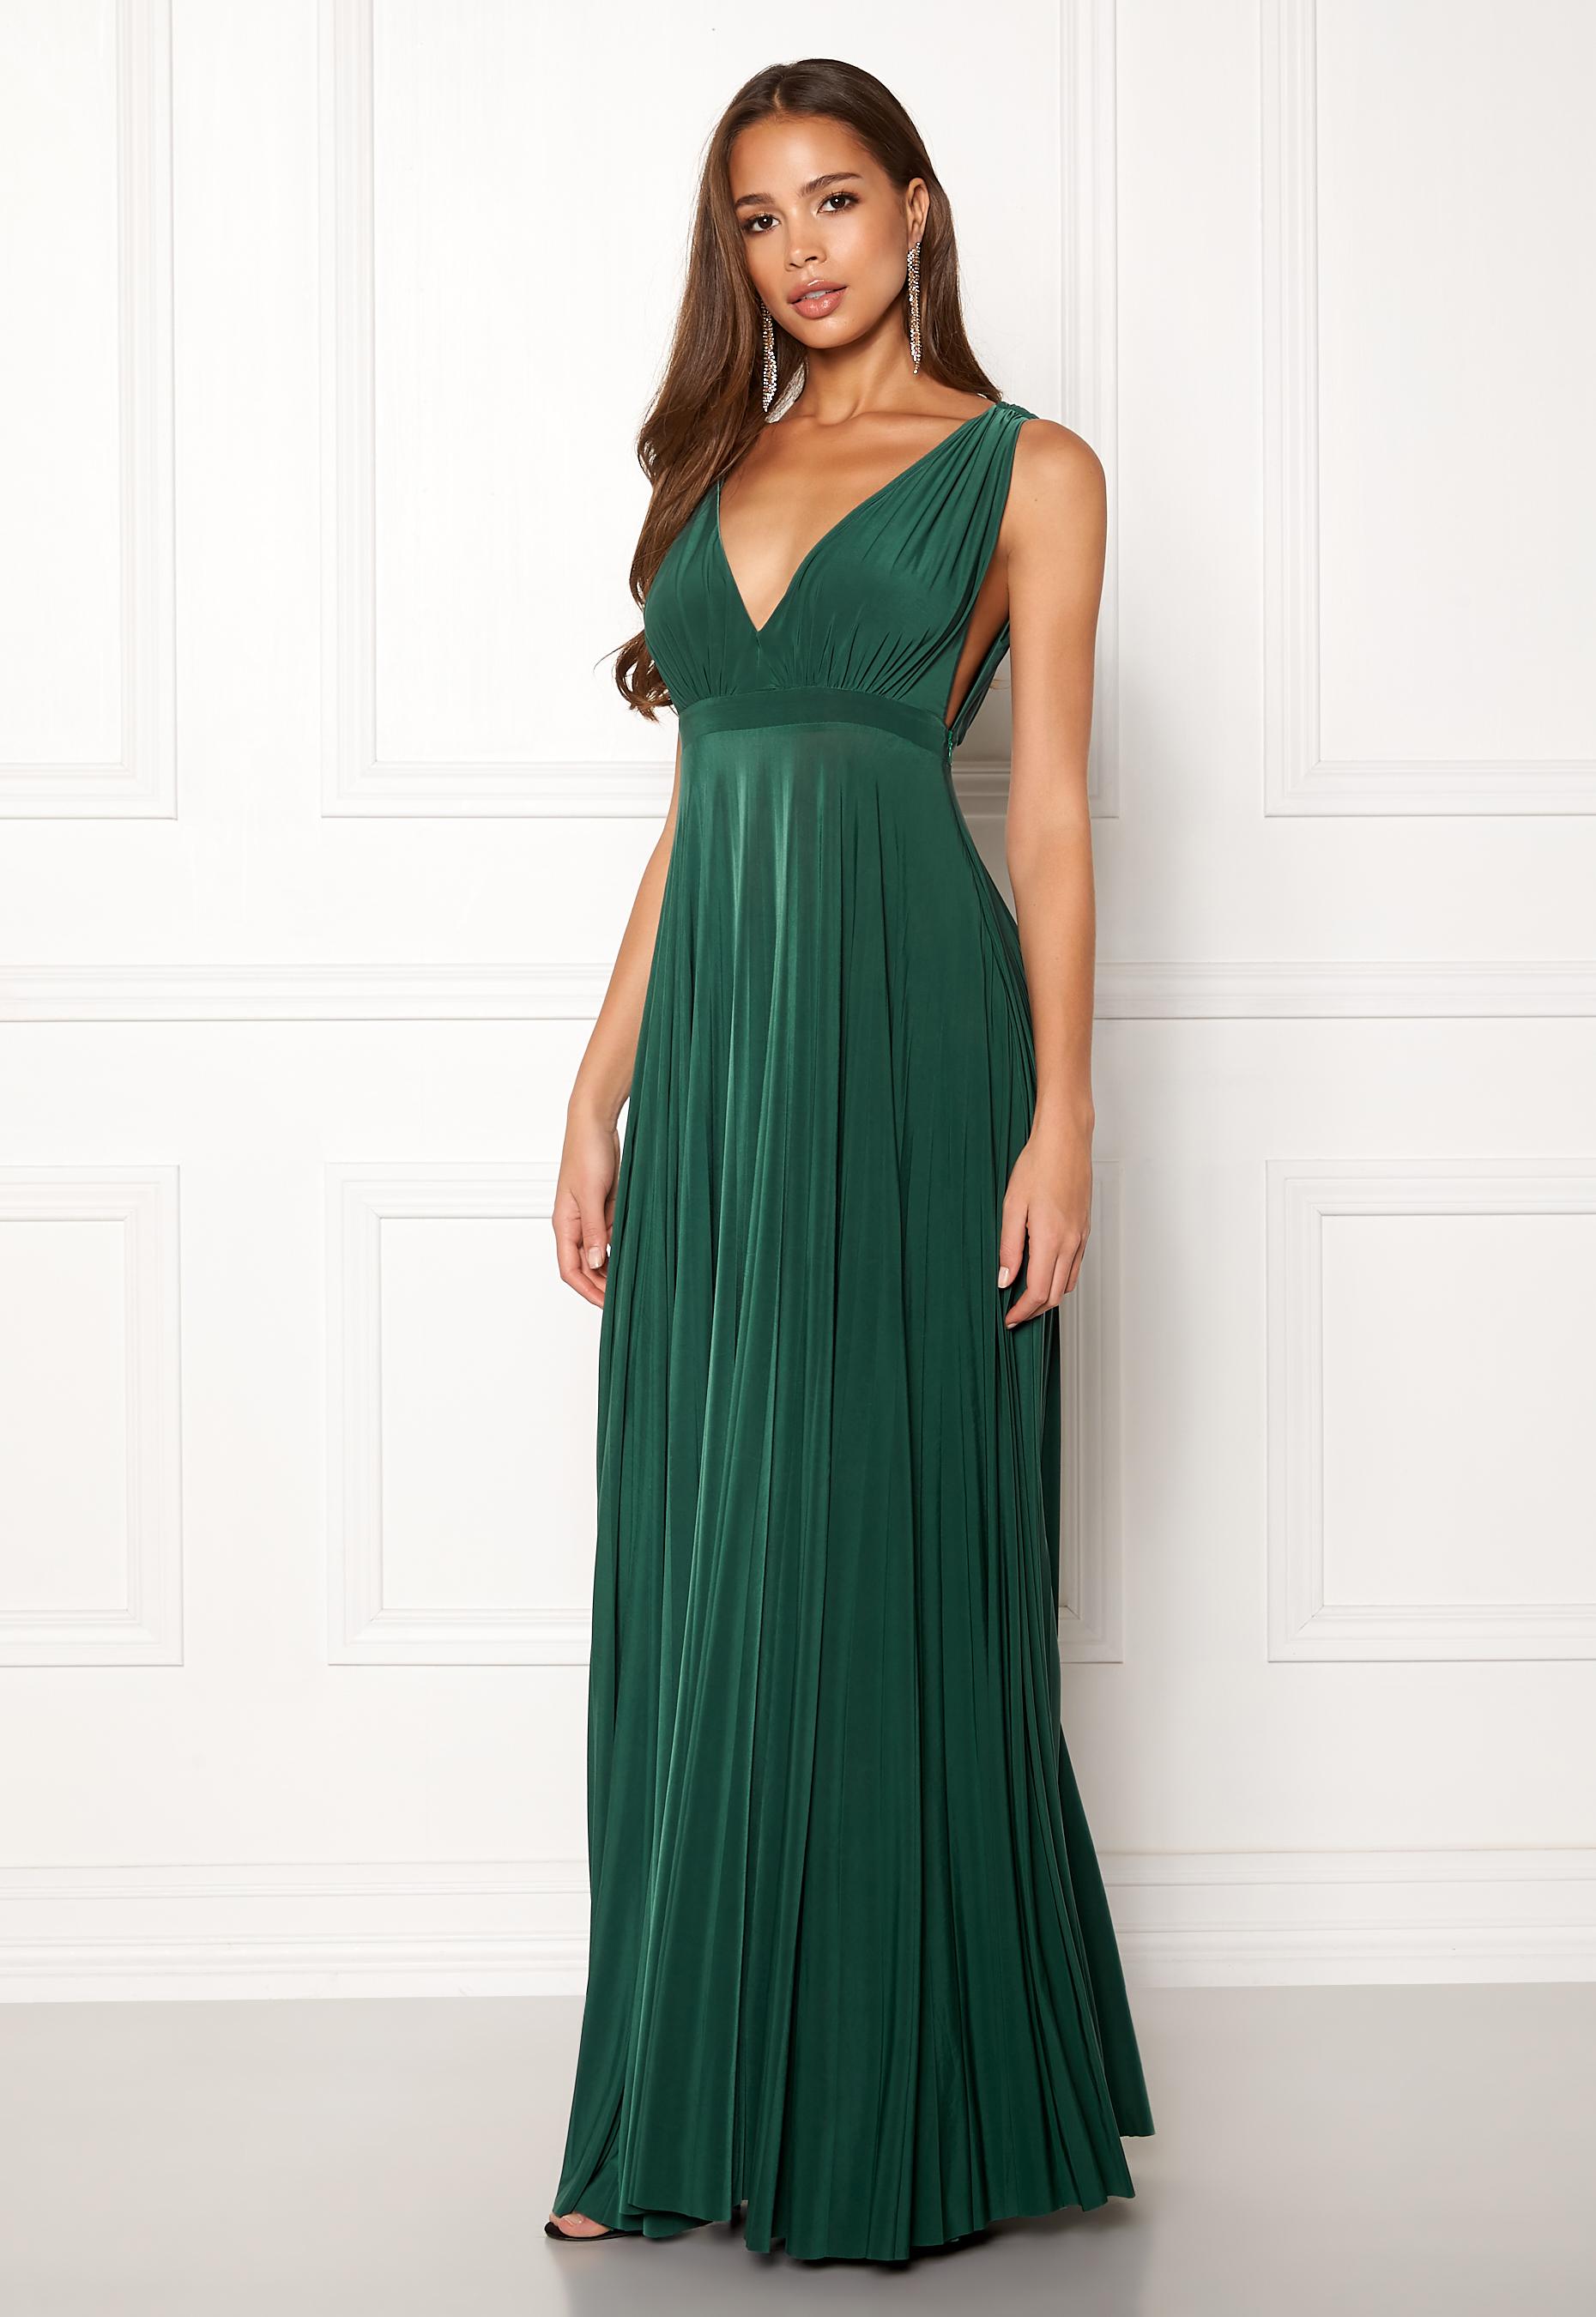 Goddiva Pleated Oscar Maxi Dress Green - Bubbleroom 4e0ba3cb89574